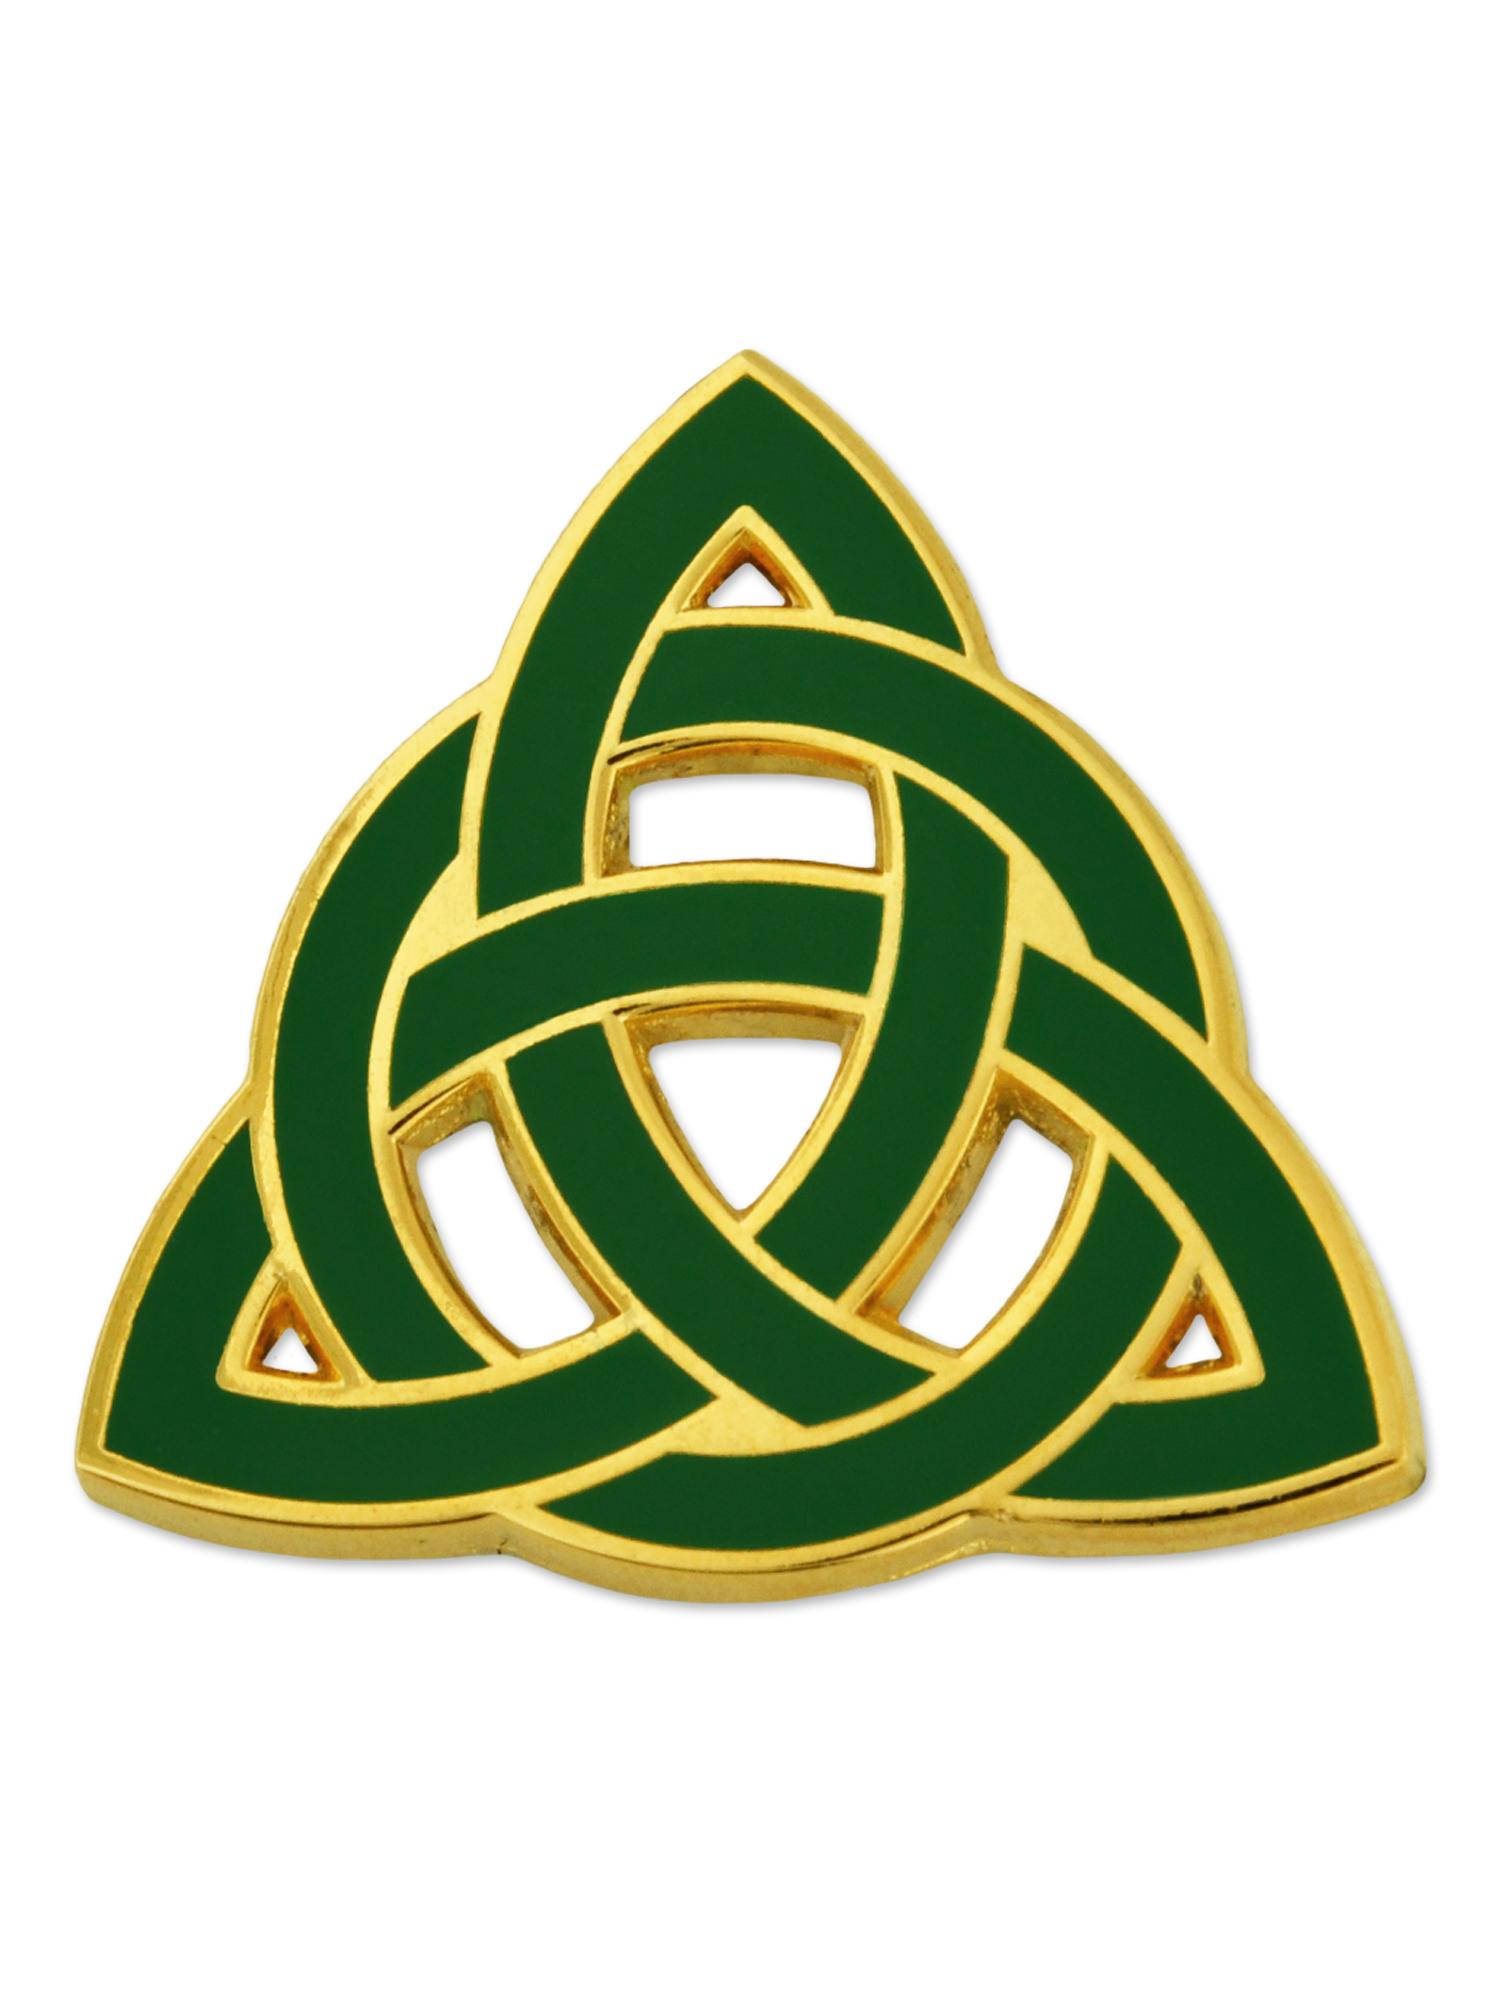 PinMart Green Camouflage Star Military Enamel Lapel Pin